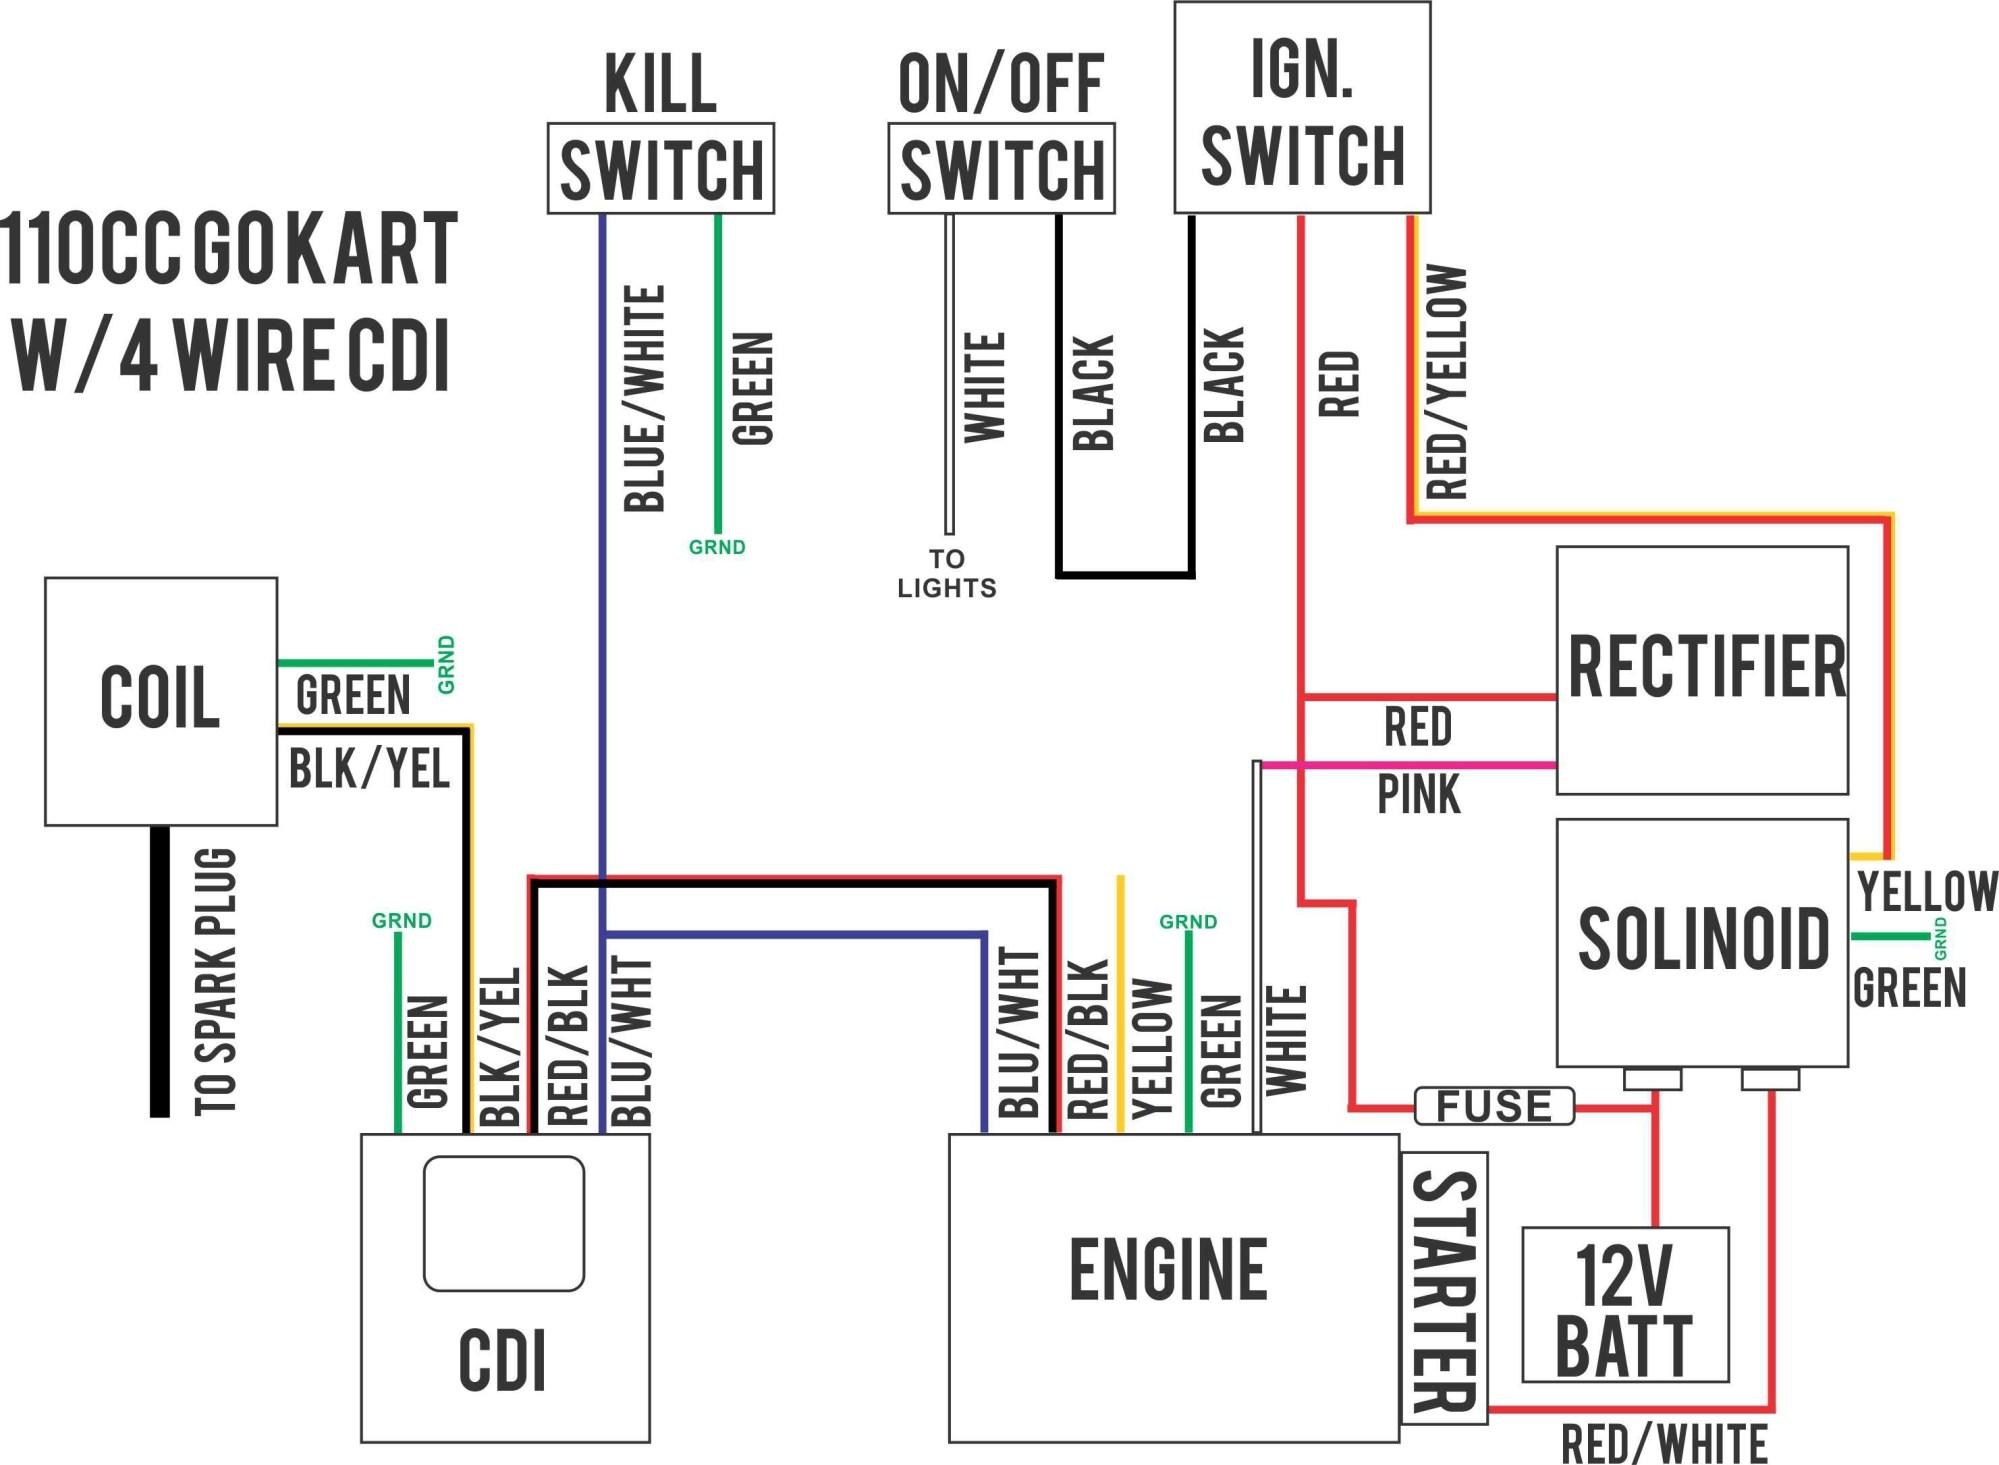 hight resolution of pocket bike engine diagram wiring diagram for x18 pocket bike new gas mini chopper ignition